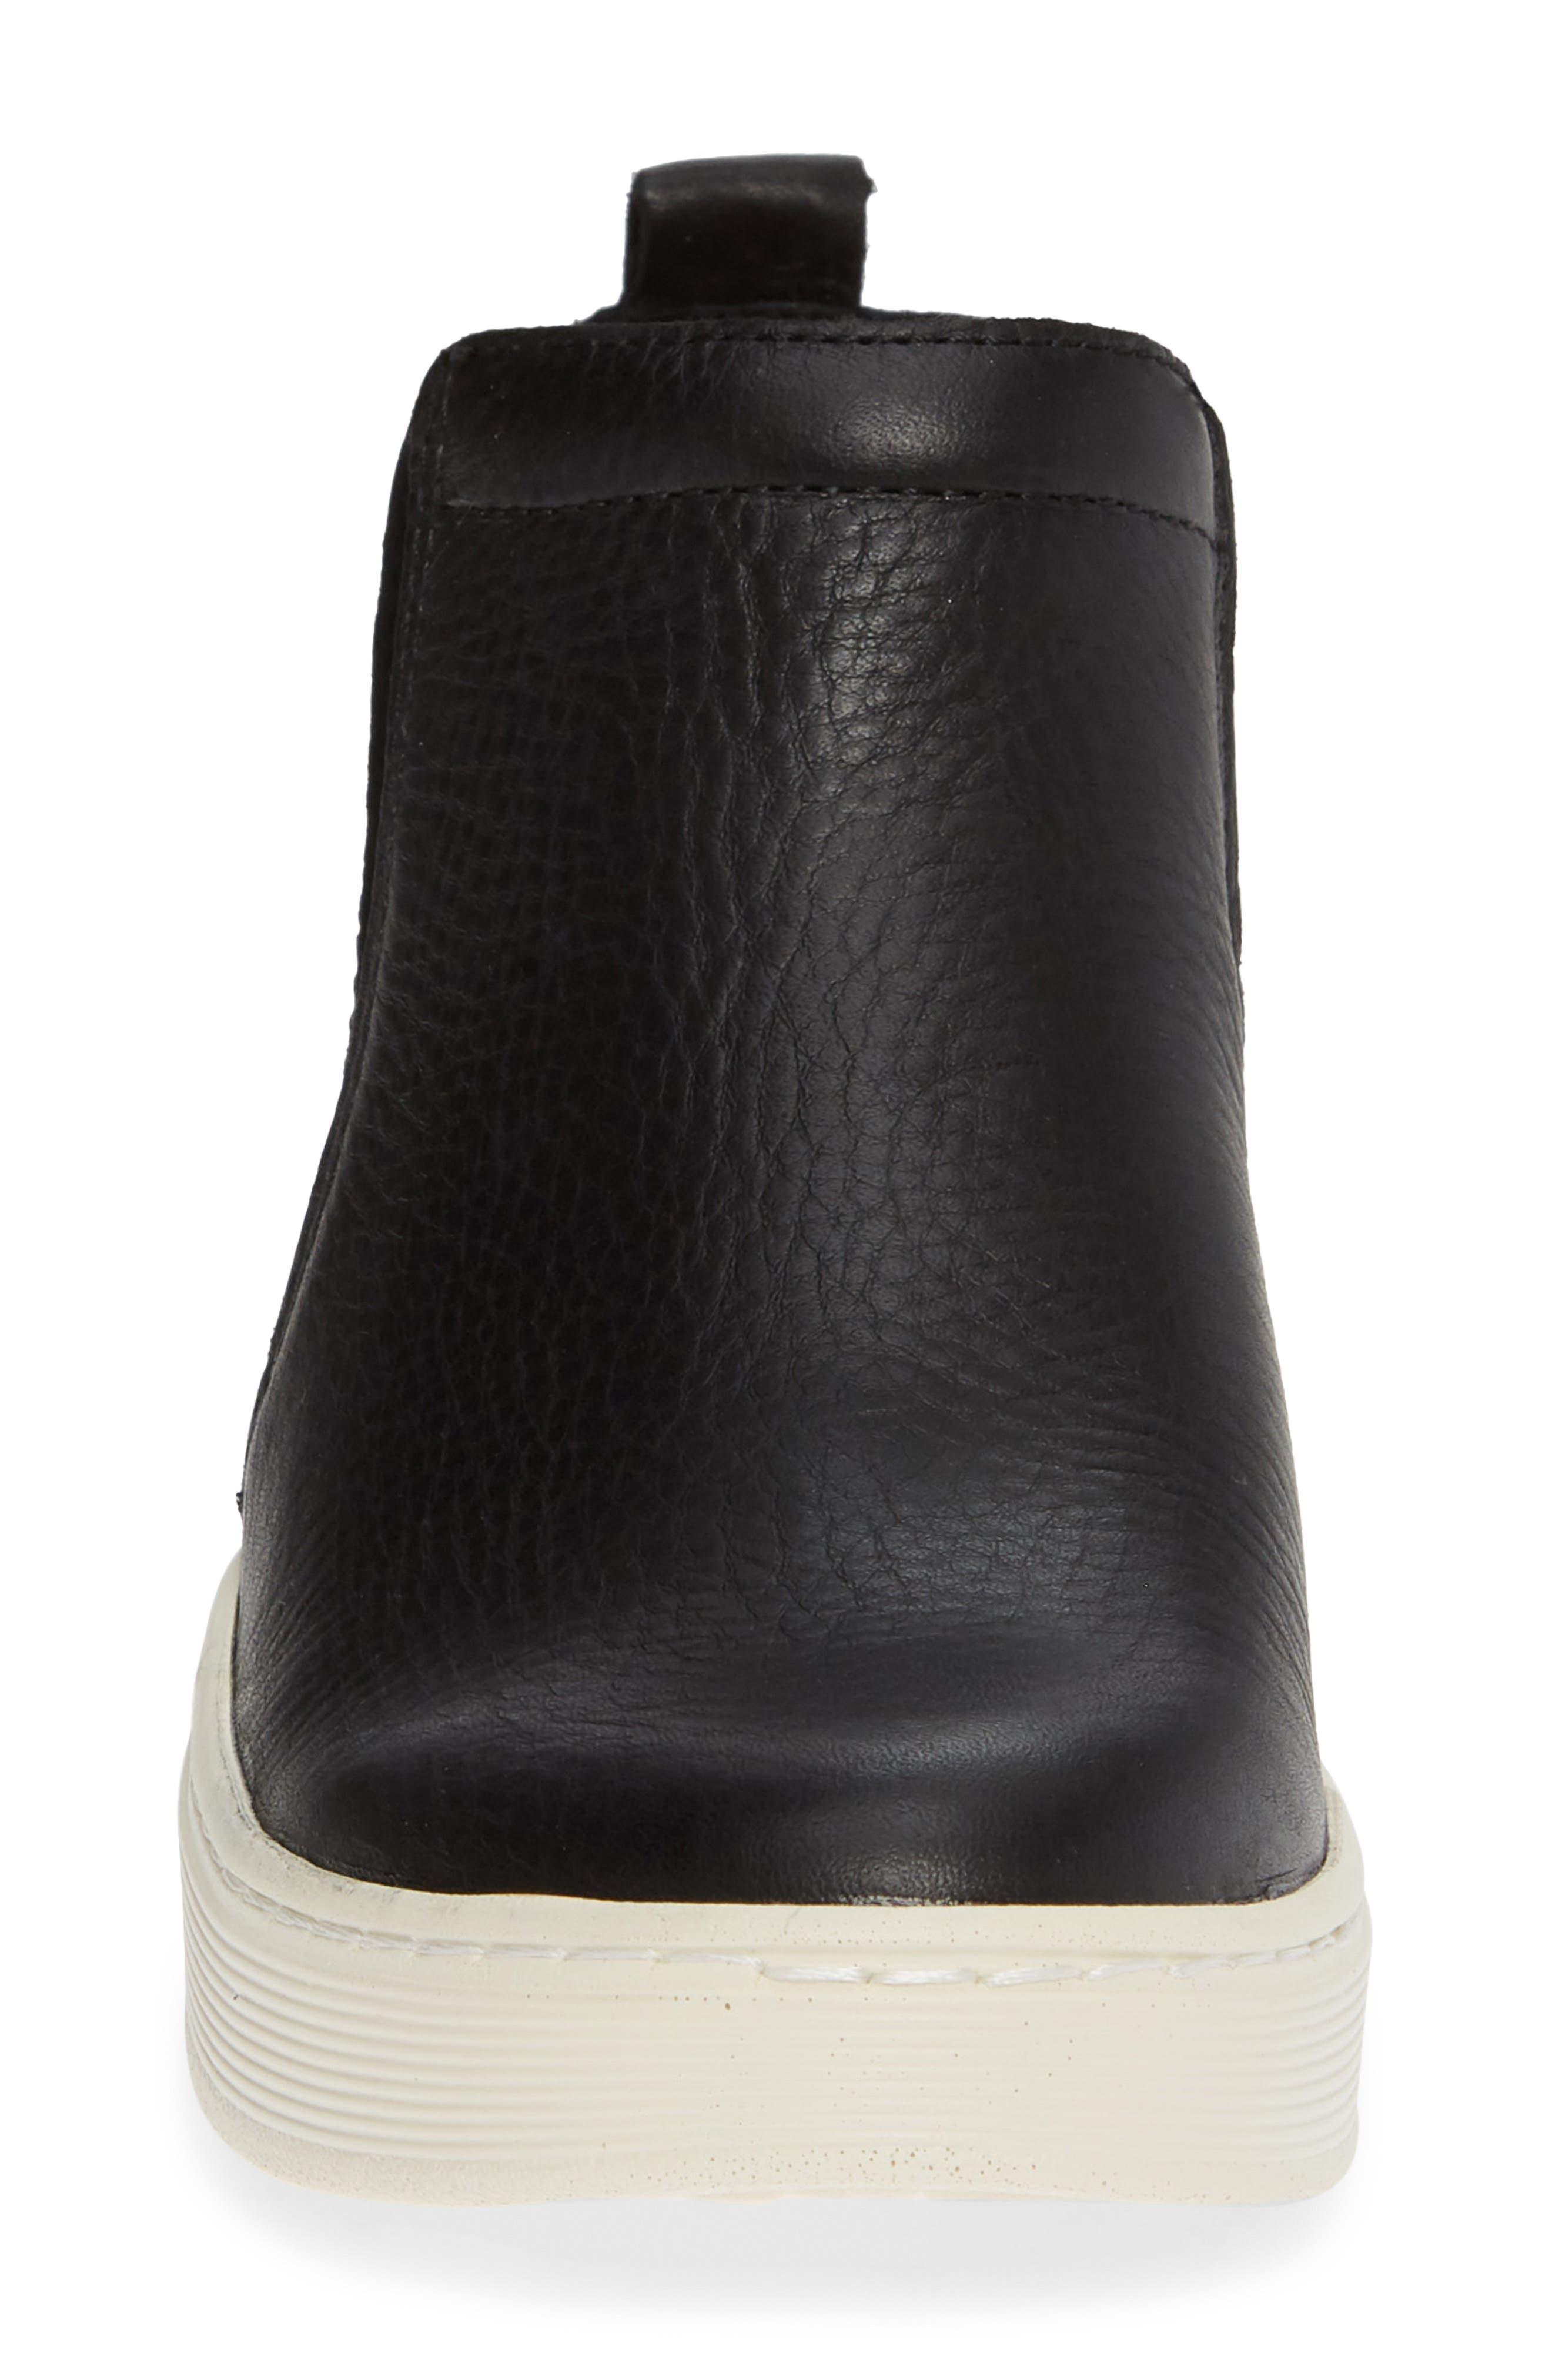 SÖFFT, Britton II Waterproof Sneaker Bootie, Alternate thumbnail 4, color, BLACK LEATHER